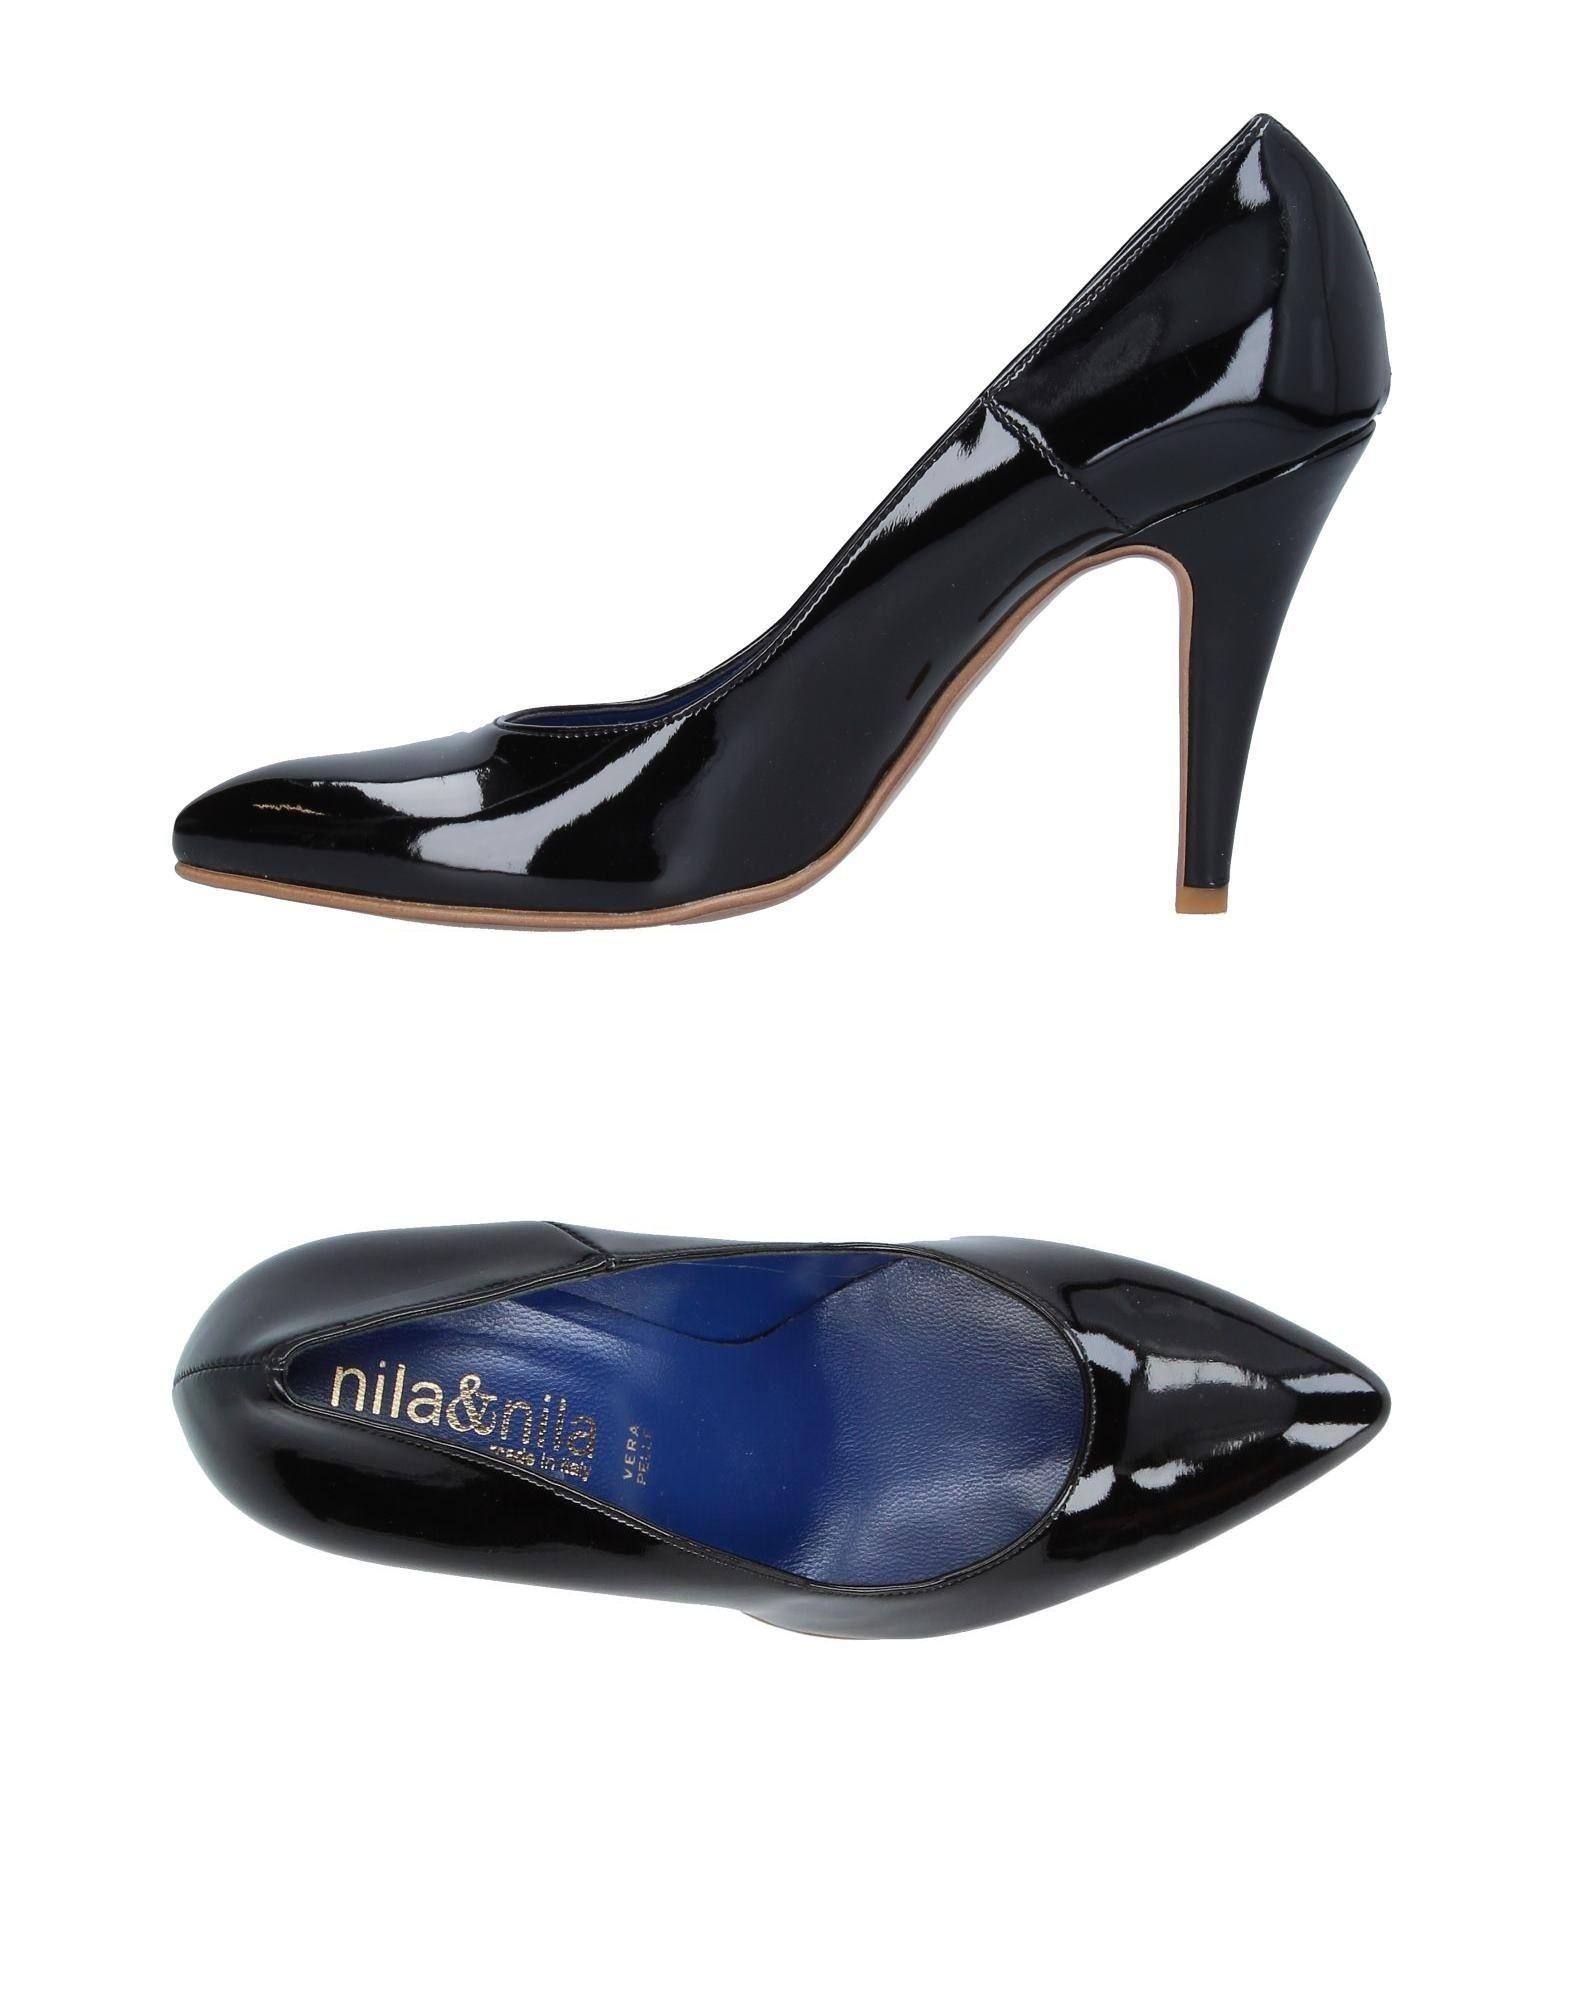 Escarpins Nila & Nila Femme - Escarpins Nila & Nila sur